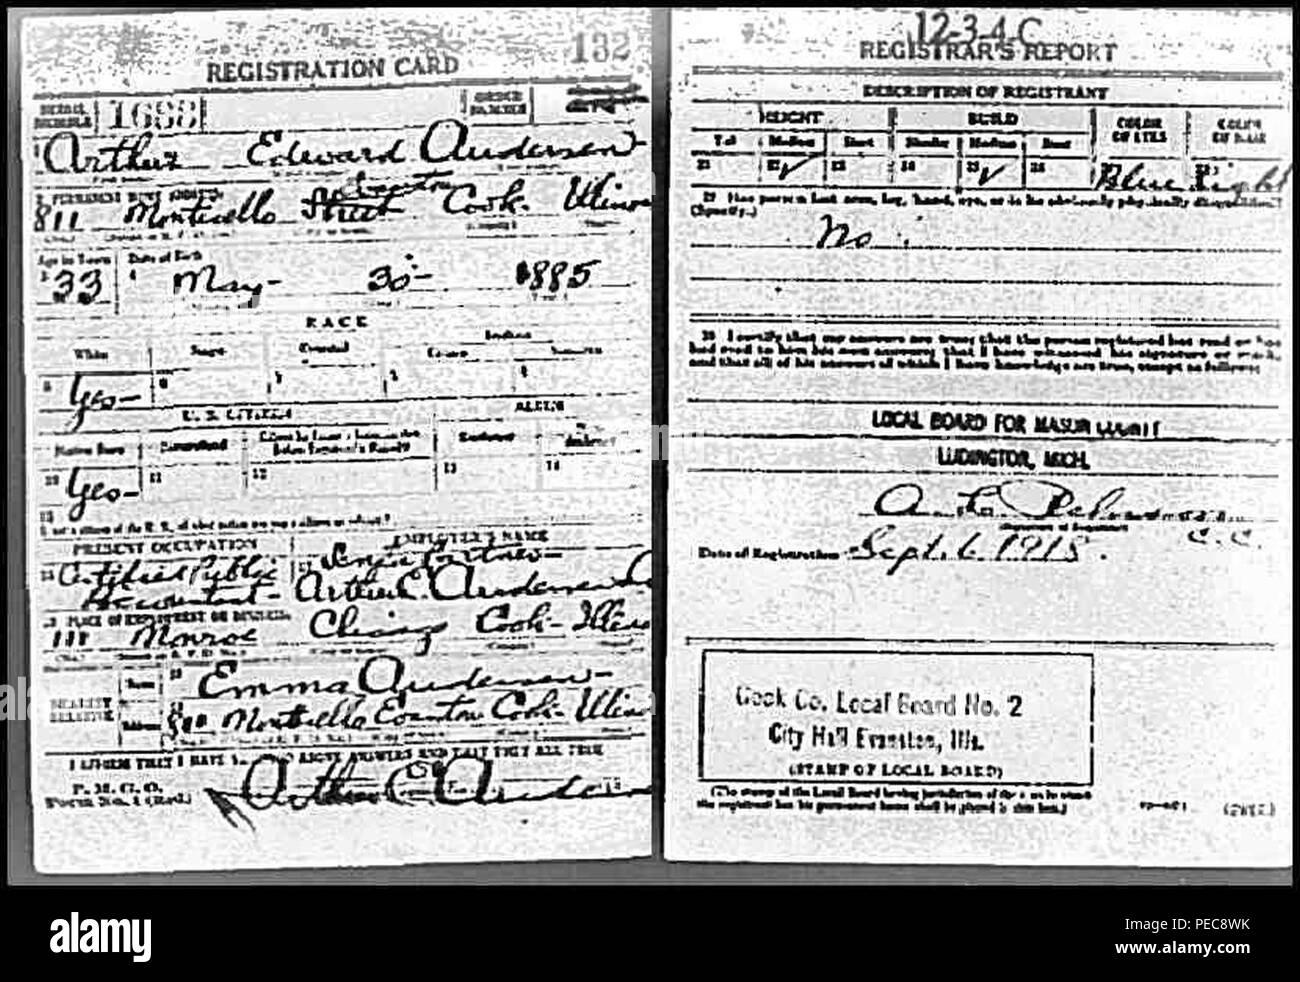 Arthur andersen draft card. - Stock Image